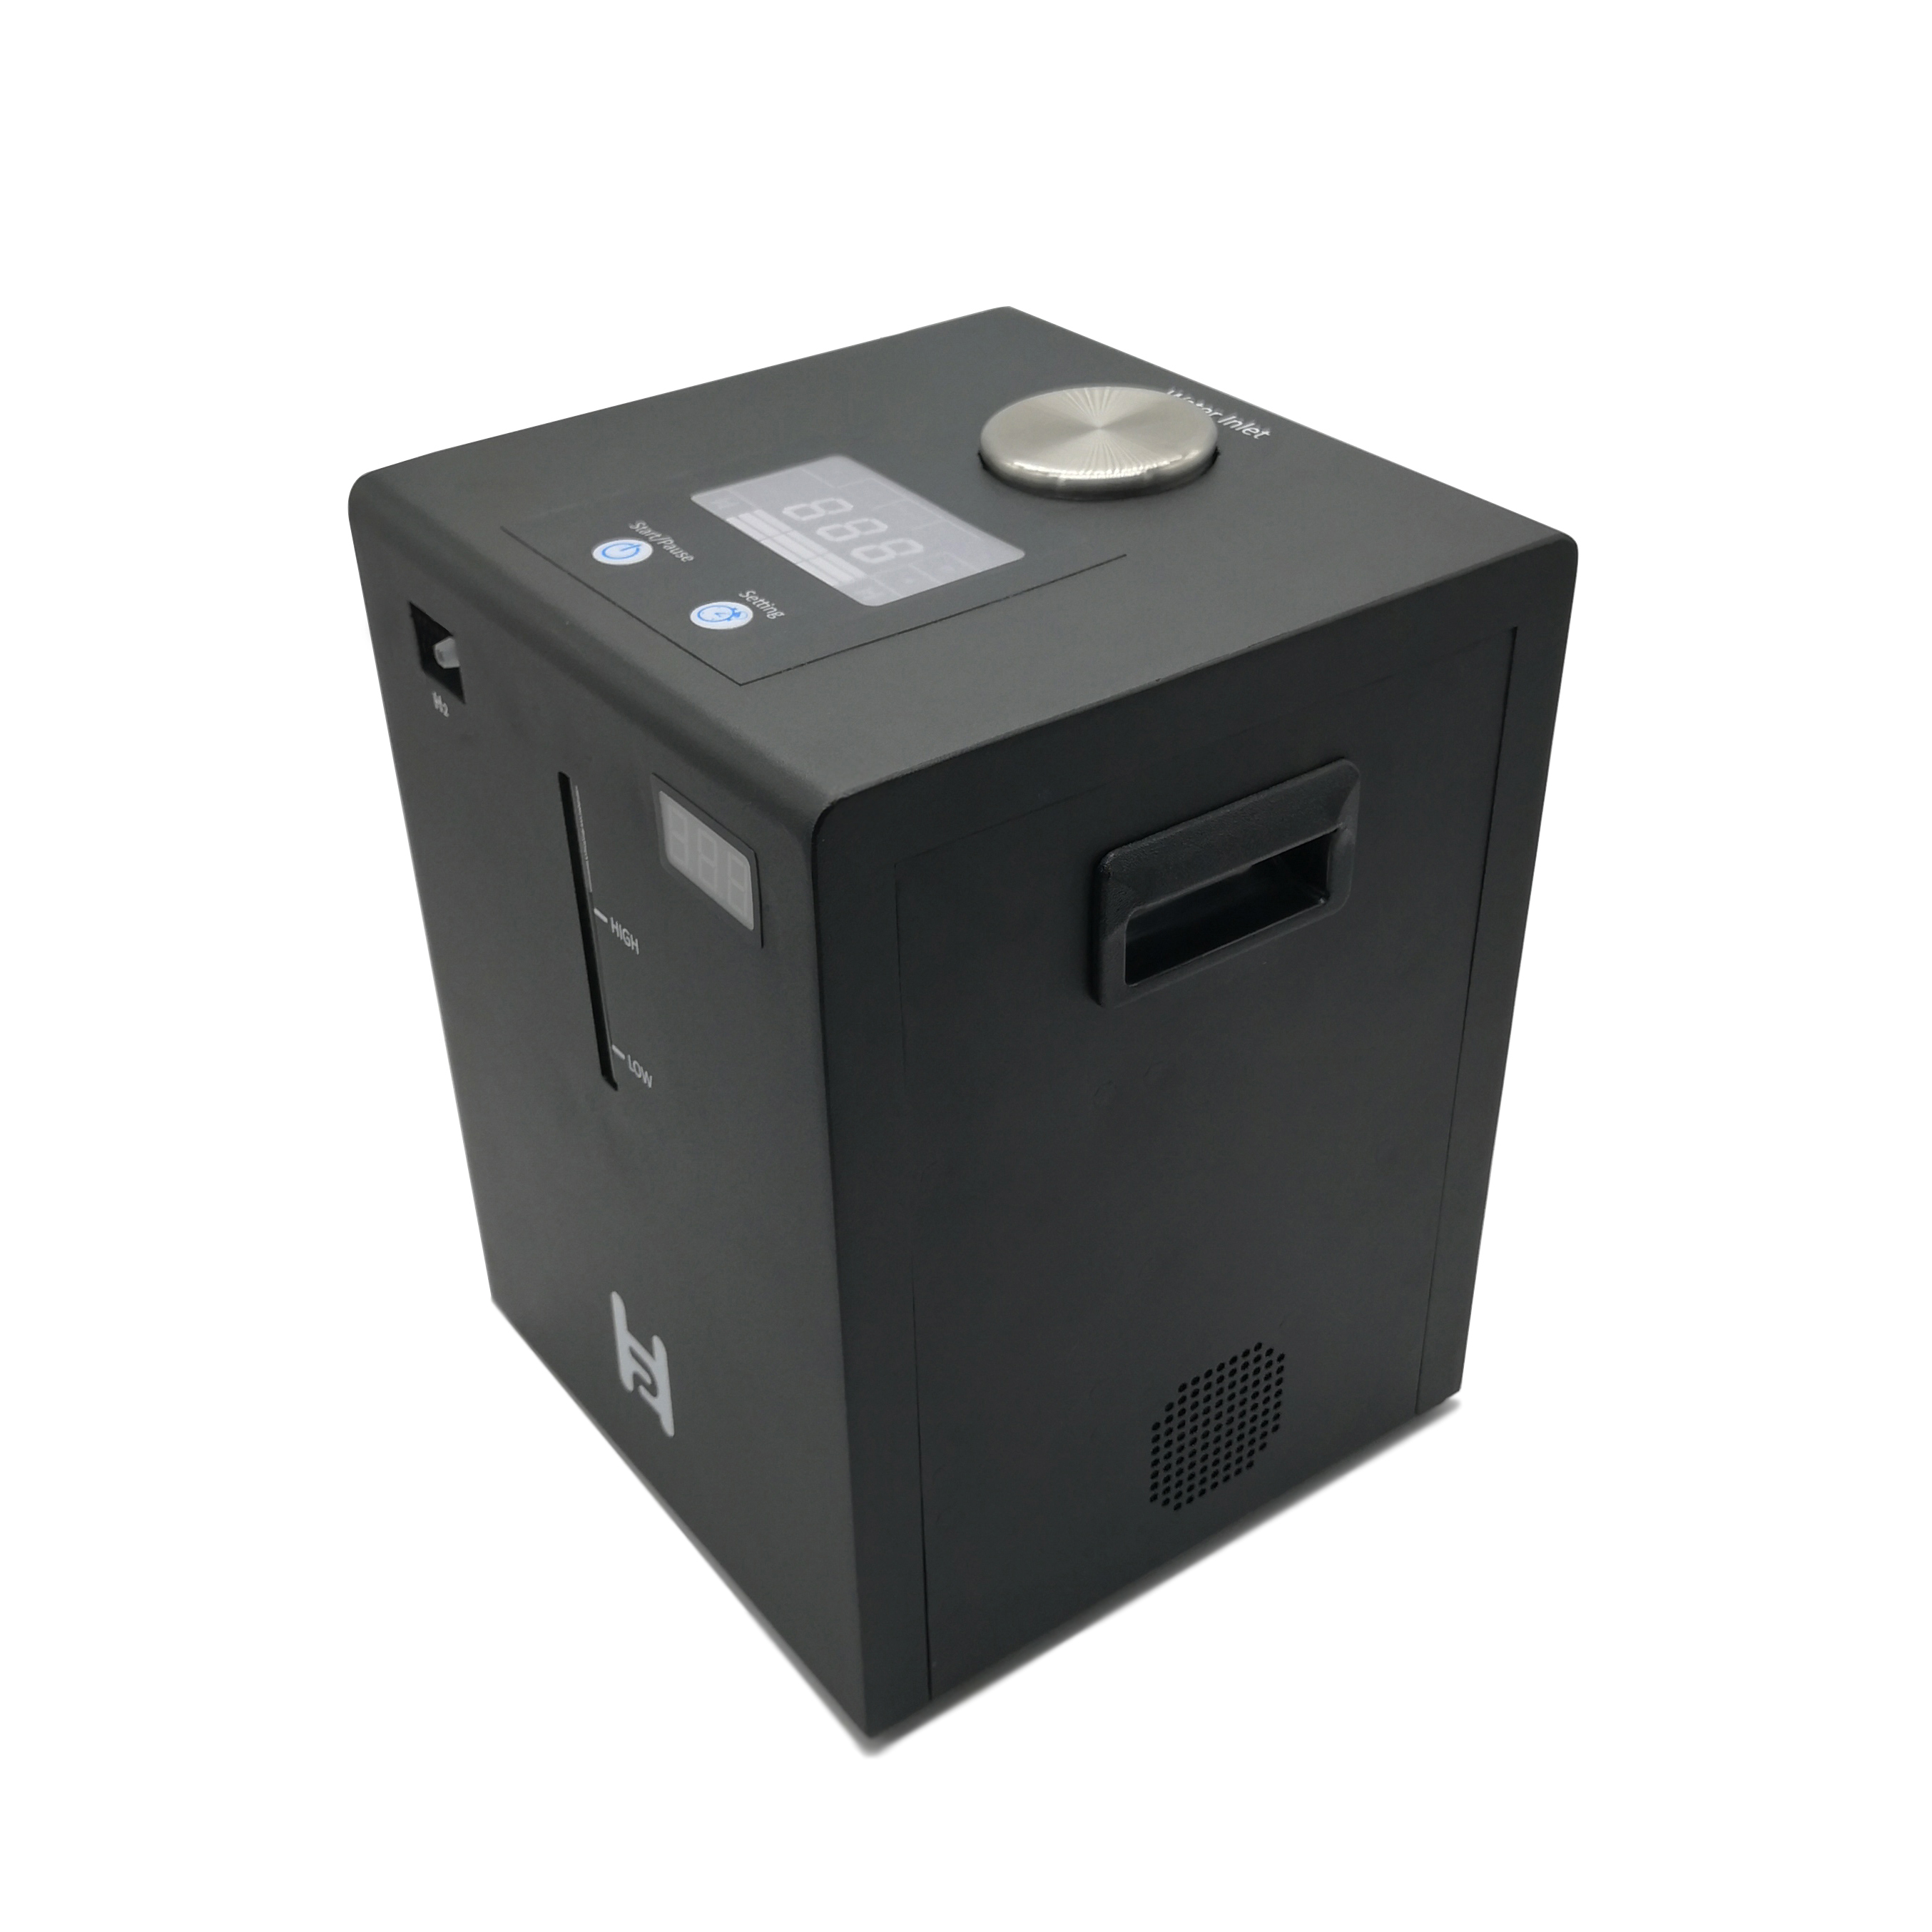 Pure Waterstof Ademhaling Machine met SPE Technologie